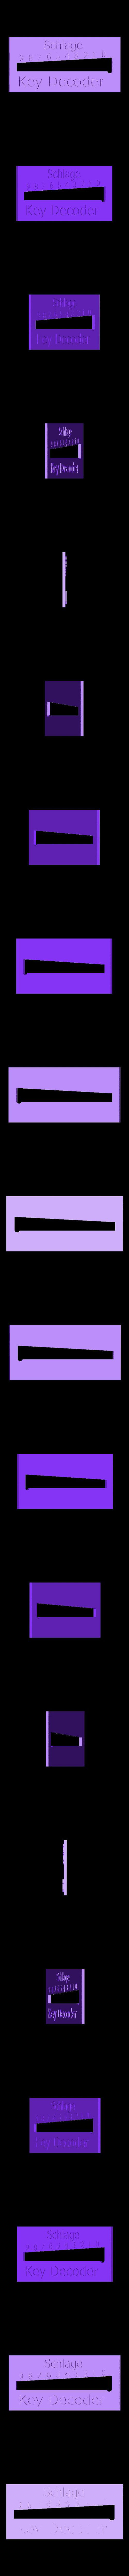 Schlage-Key-Decoder.stl Download free STL file Key Decoder (For duplicating house keys) • 3D printer template, Hoofbaugh